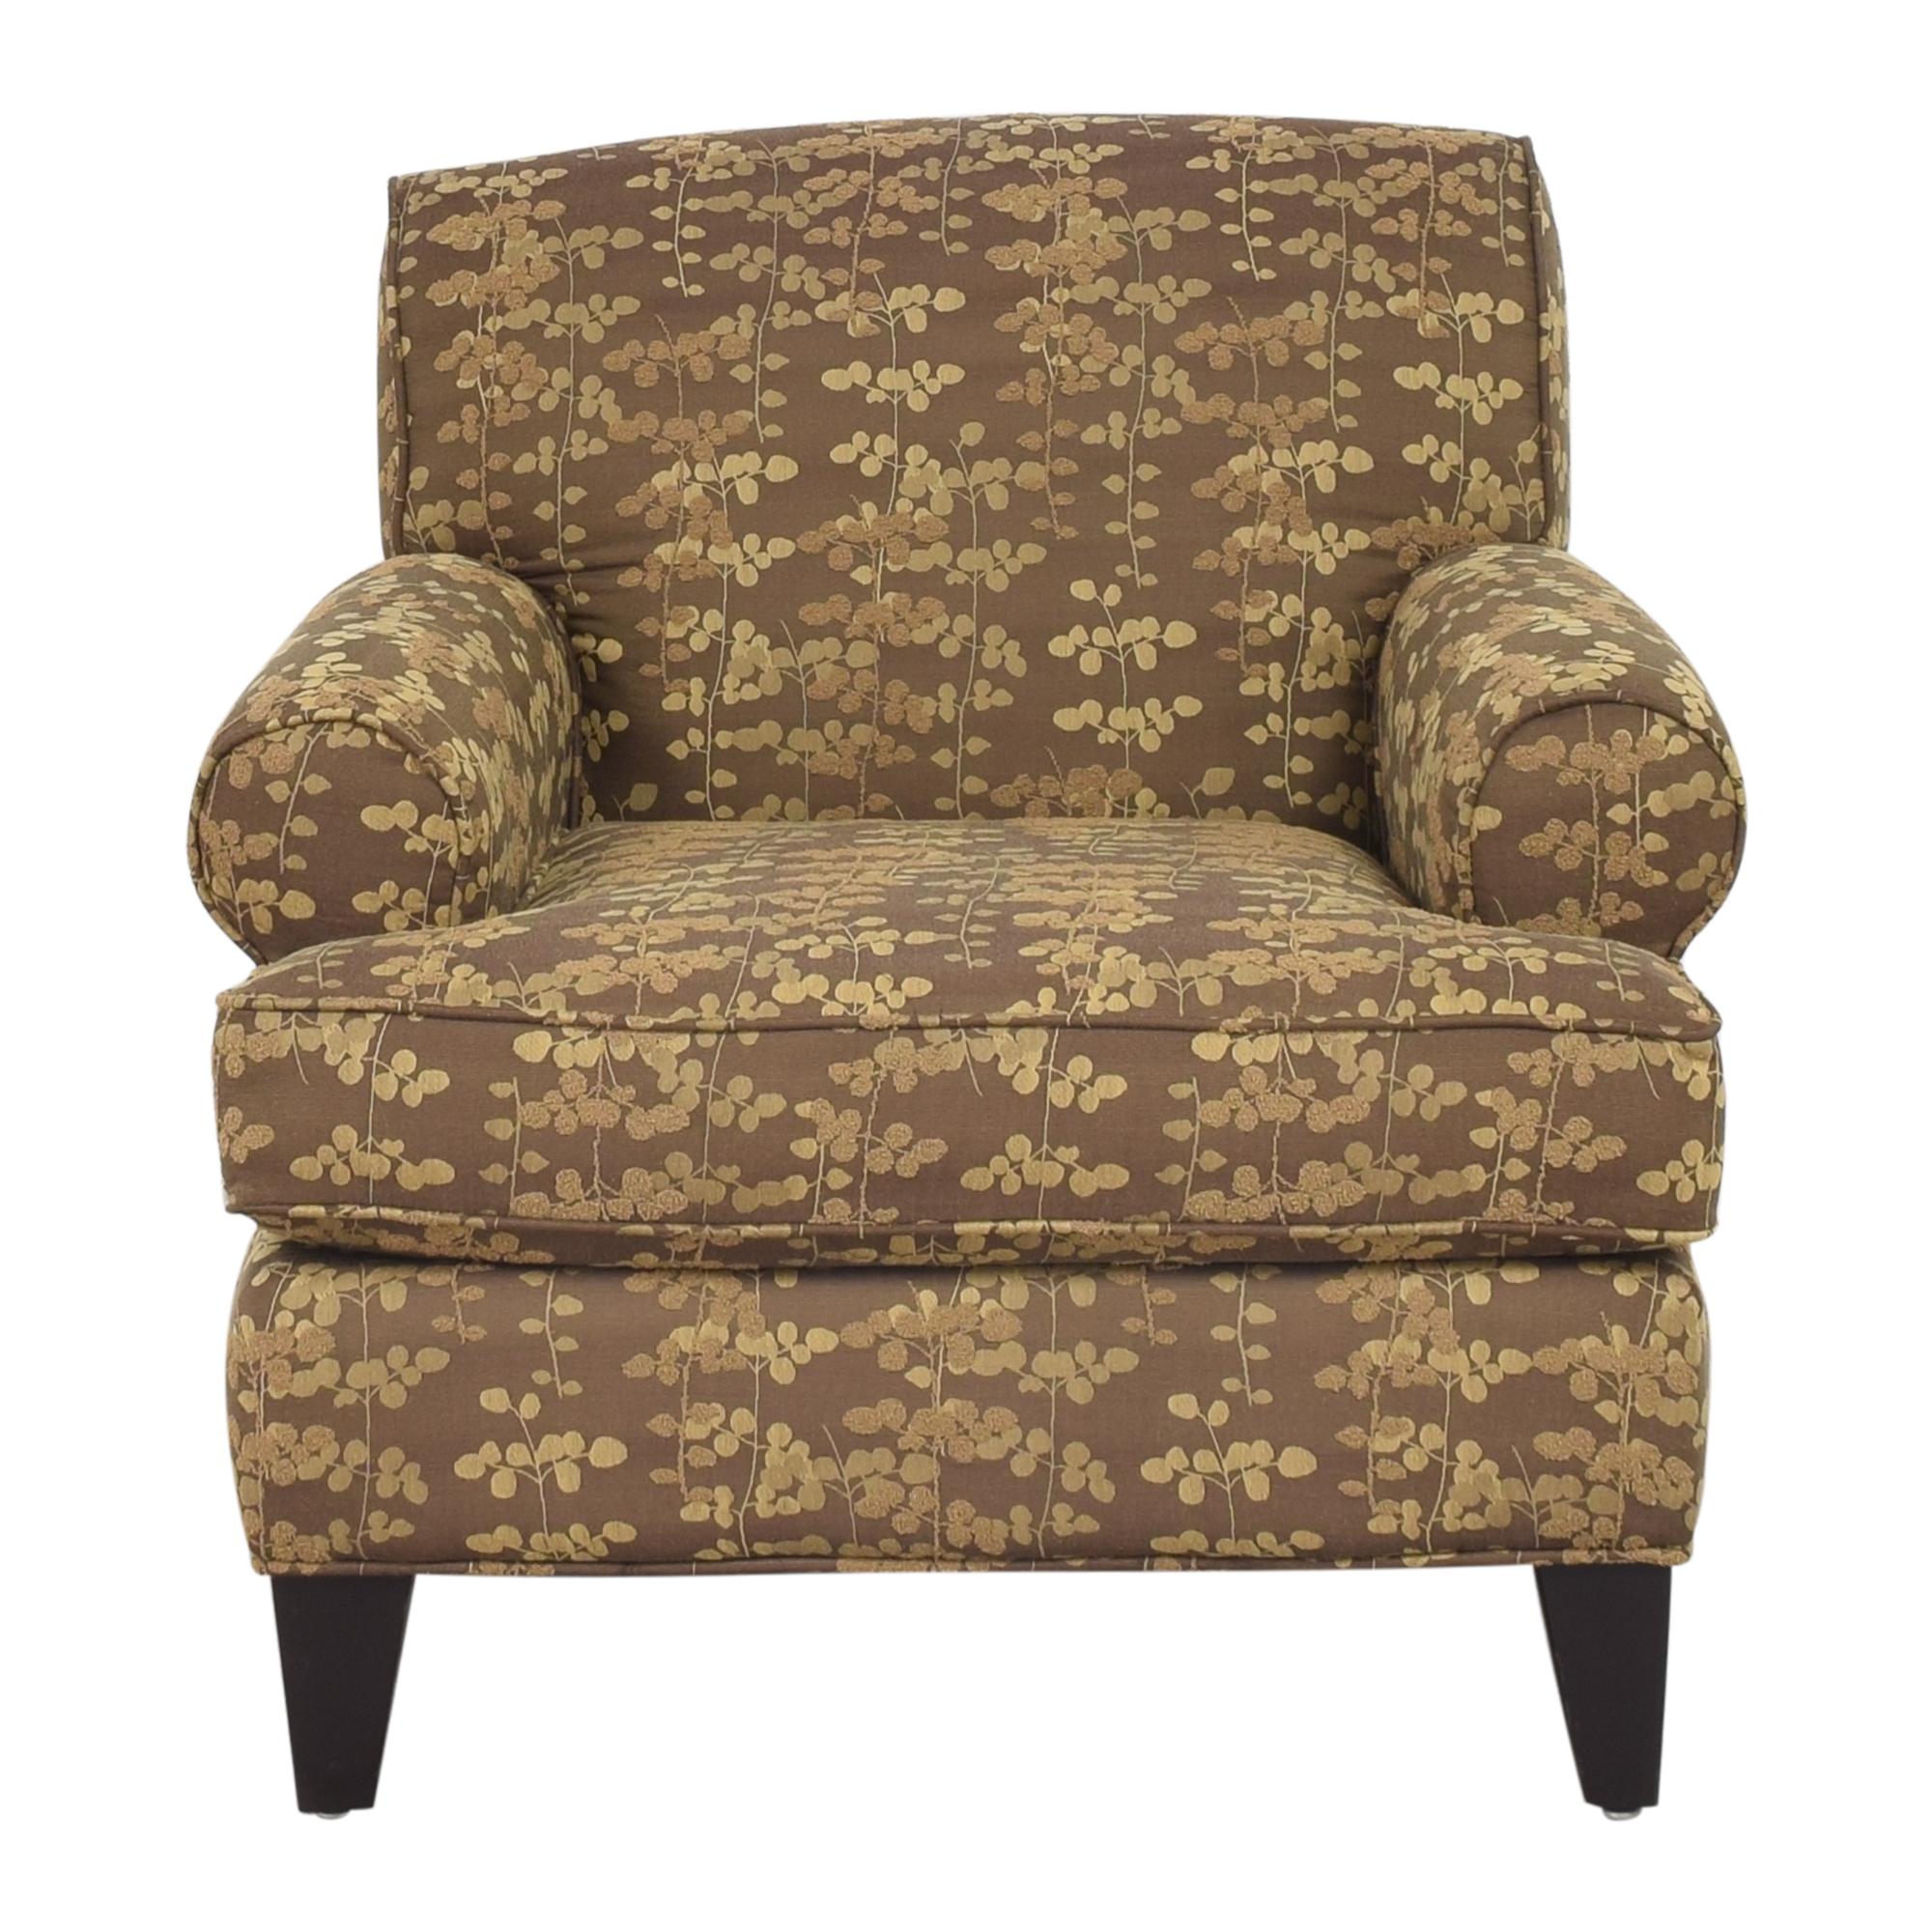 Macy's Macy's Roll Arm Club Chair dimensions